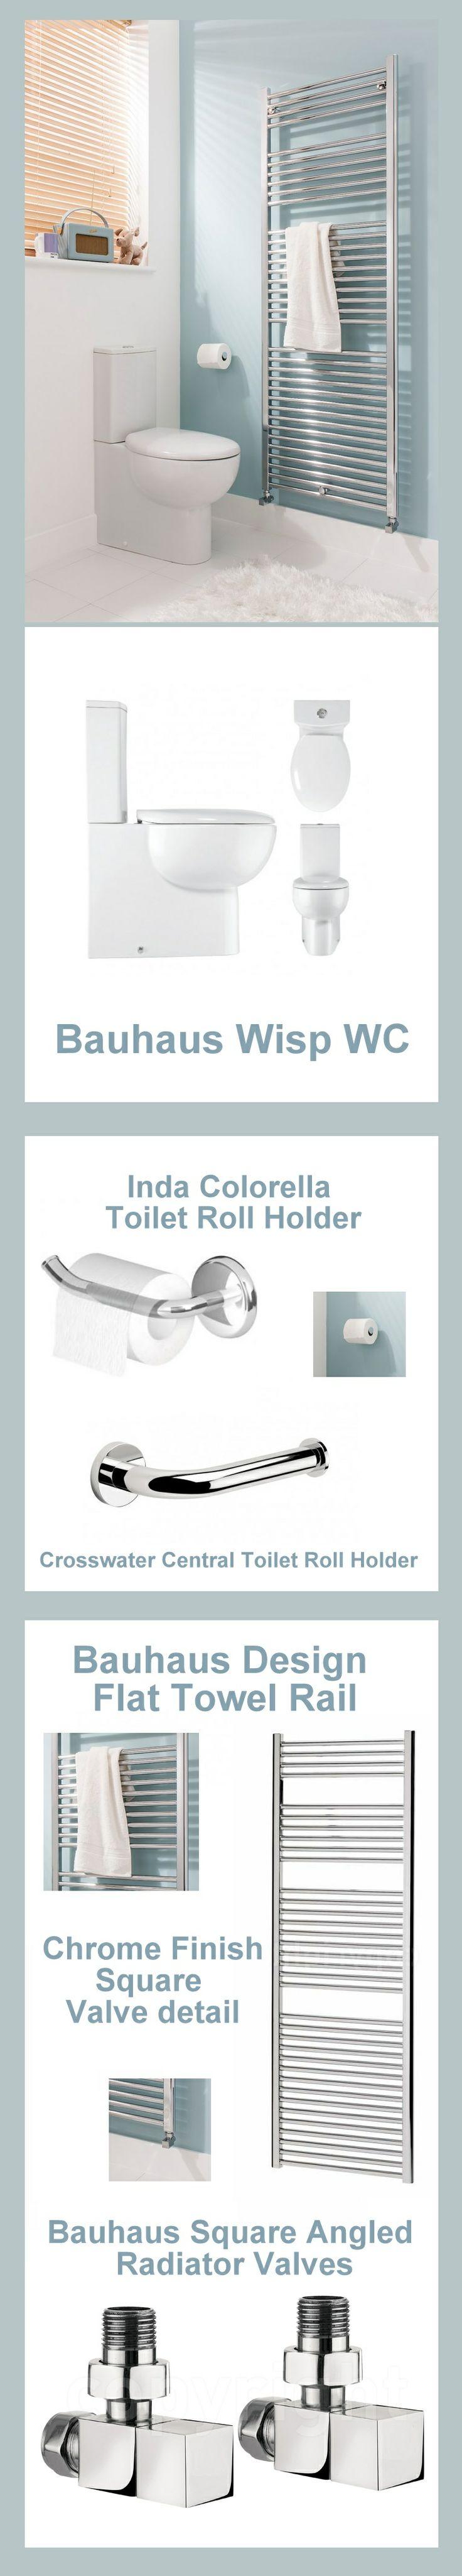 #Bathroom inspiration:  Featuring the Bauhaus Wisp WC #Duck #Egg #Blue